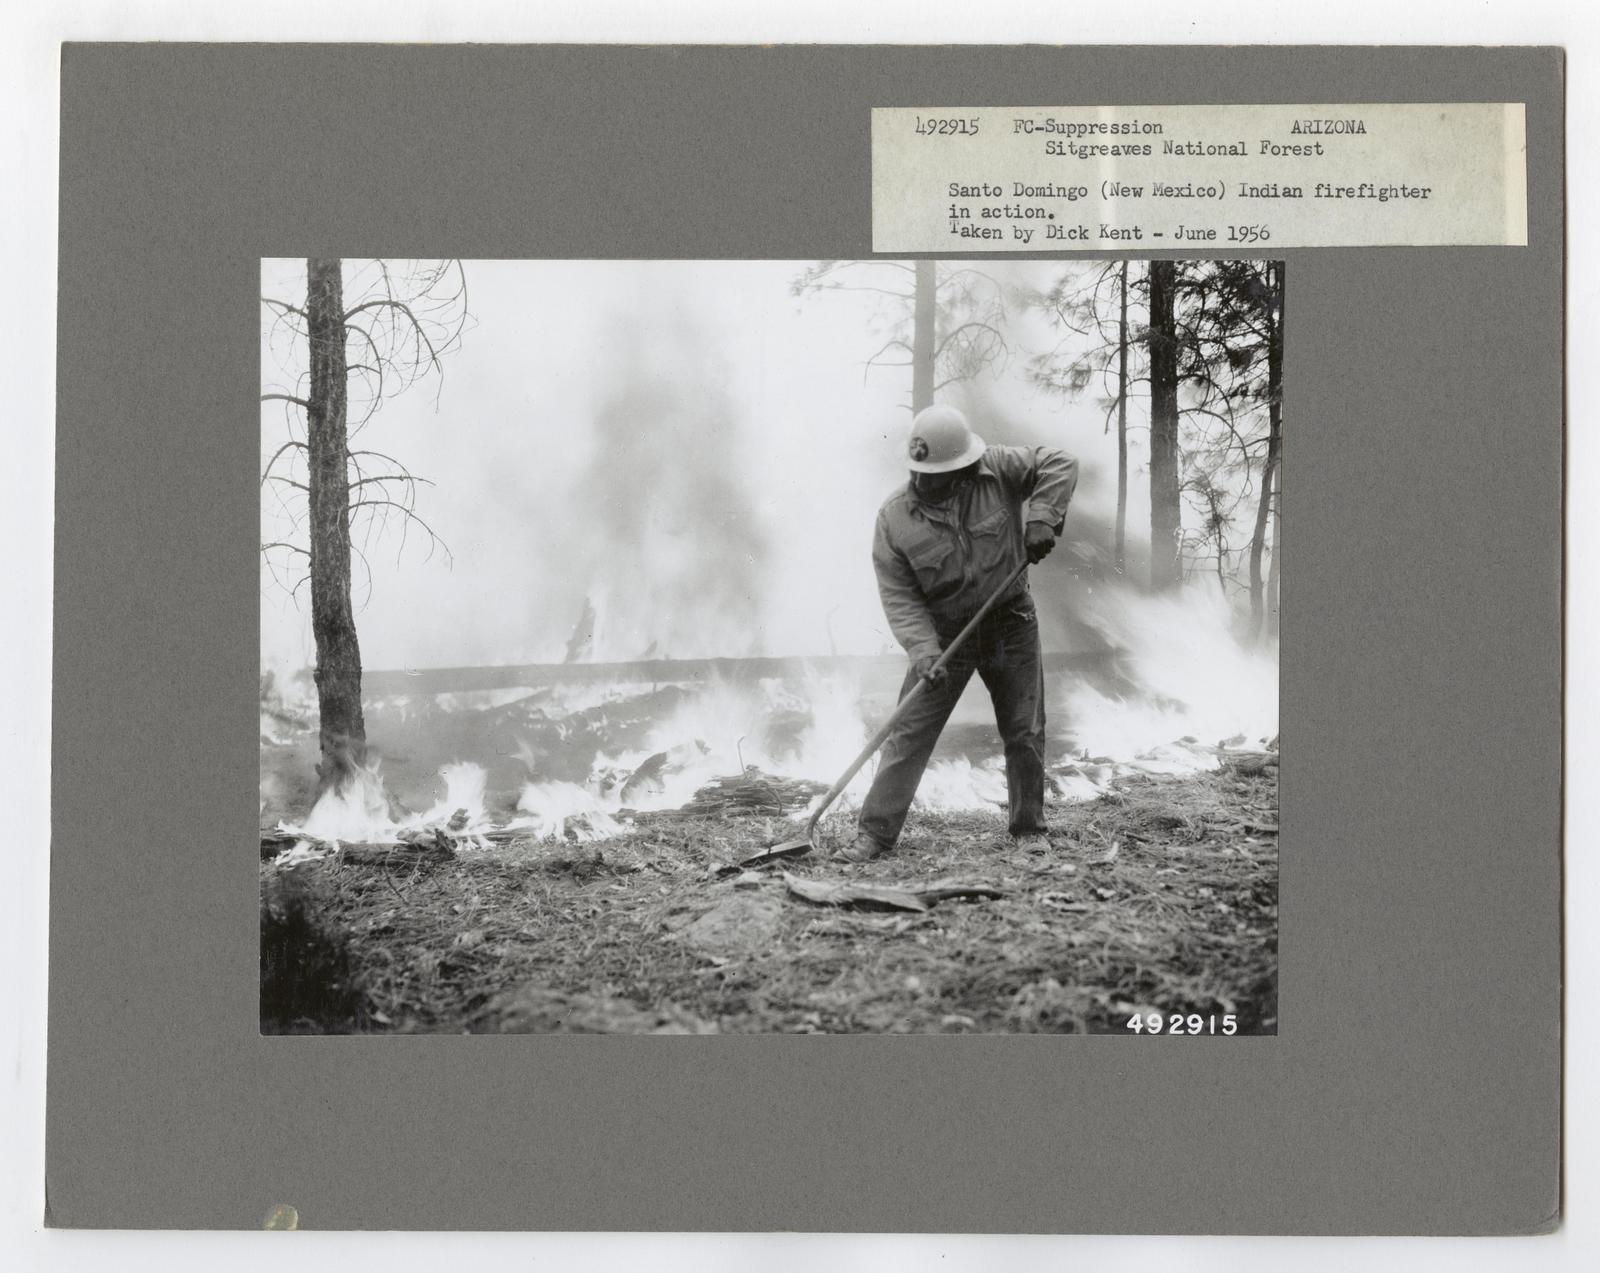 Fire Suppression: Ground Handtools - All States